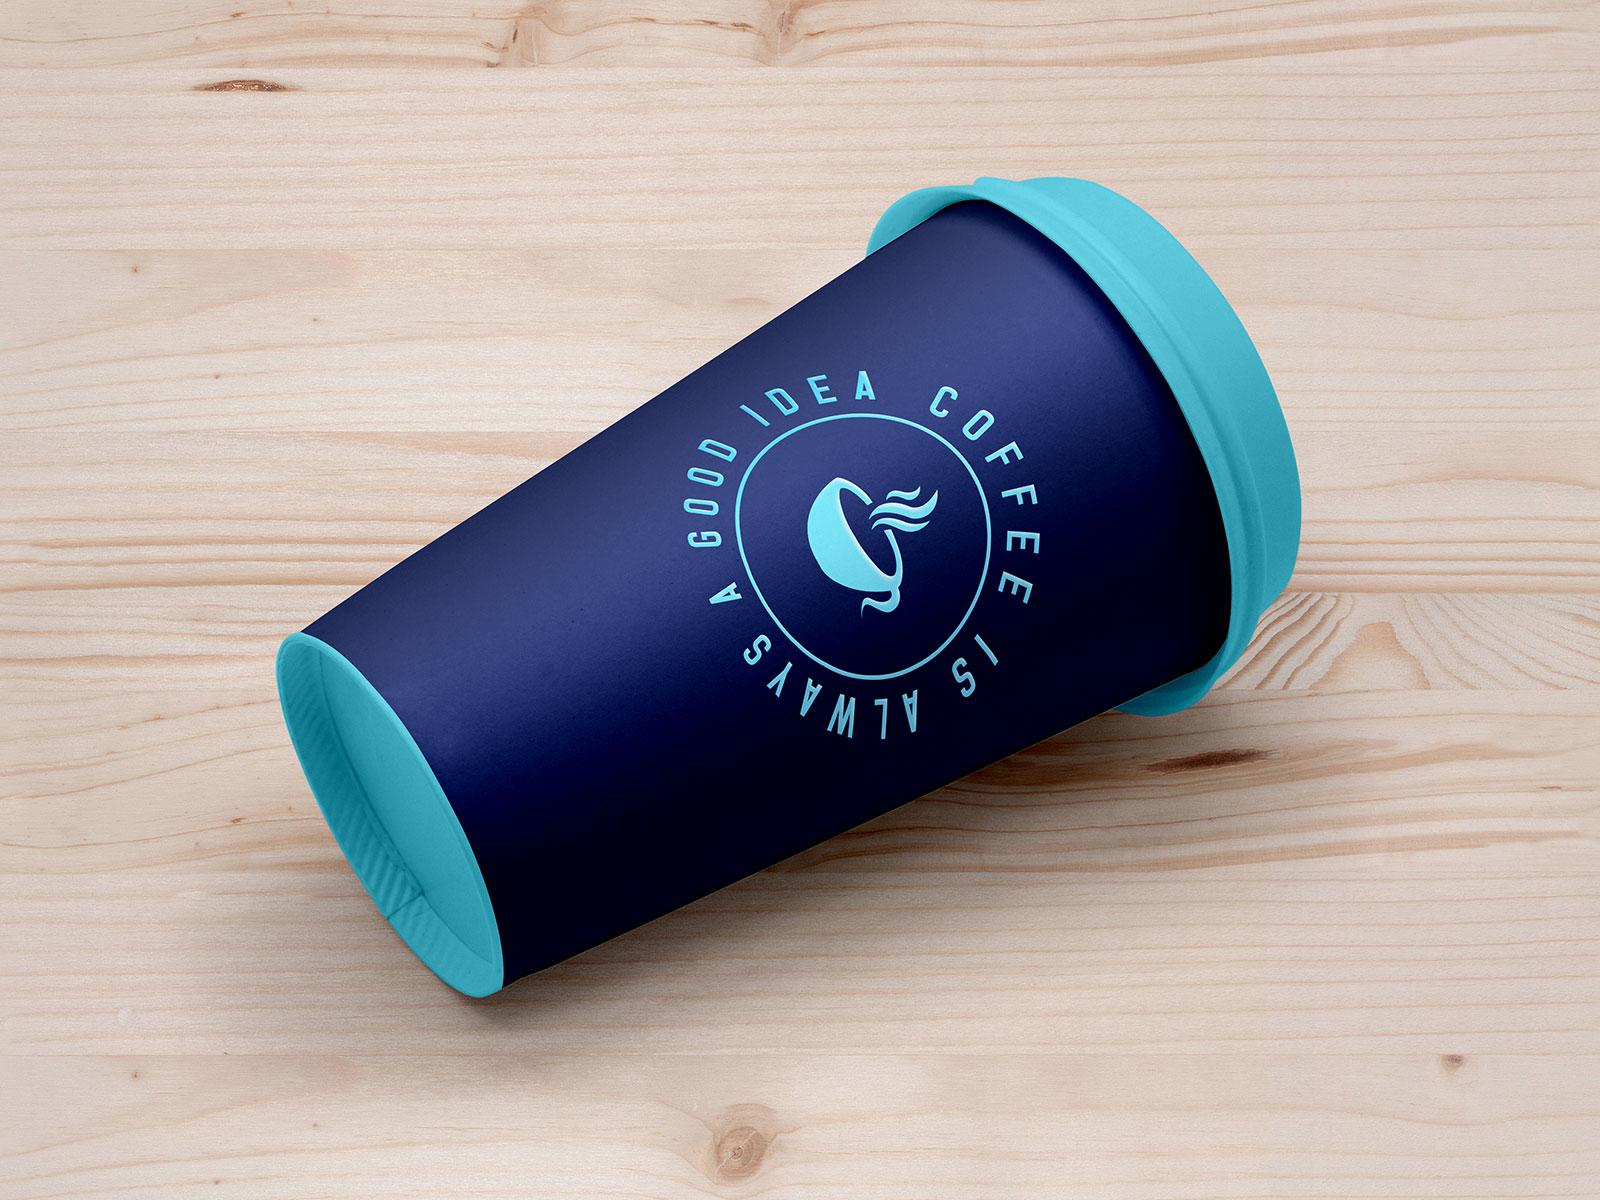 Free-Coffee-Cup-Lying-on-Floor-Mockup-PSD-2